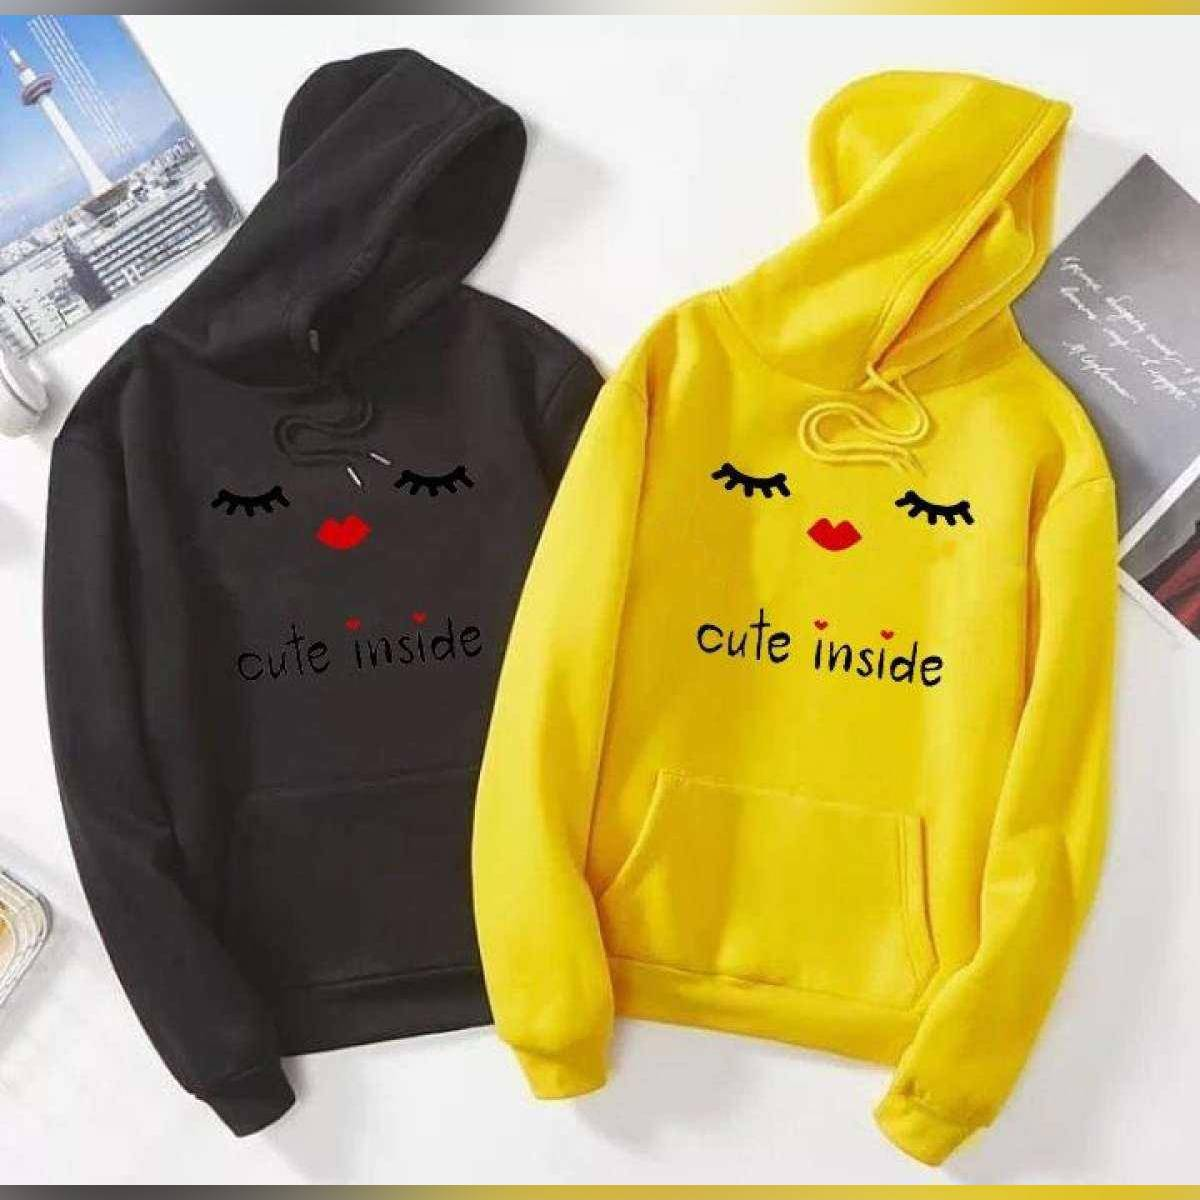 Full Sleeves Sweatshirts / Hoddie for girls new and stylish Winter Wear ,Round Neck